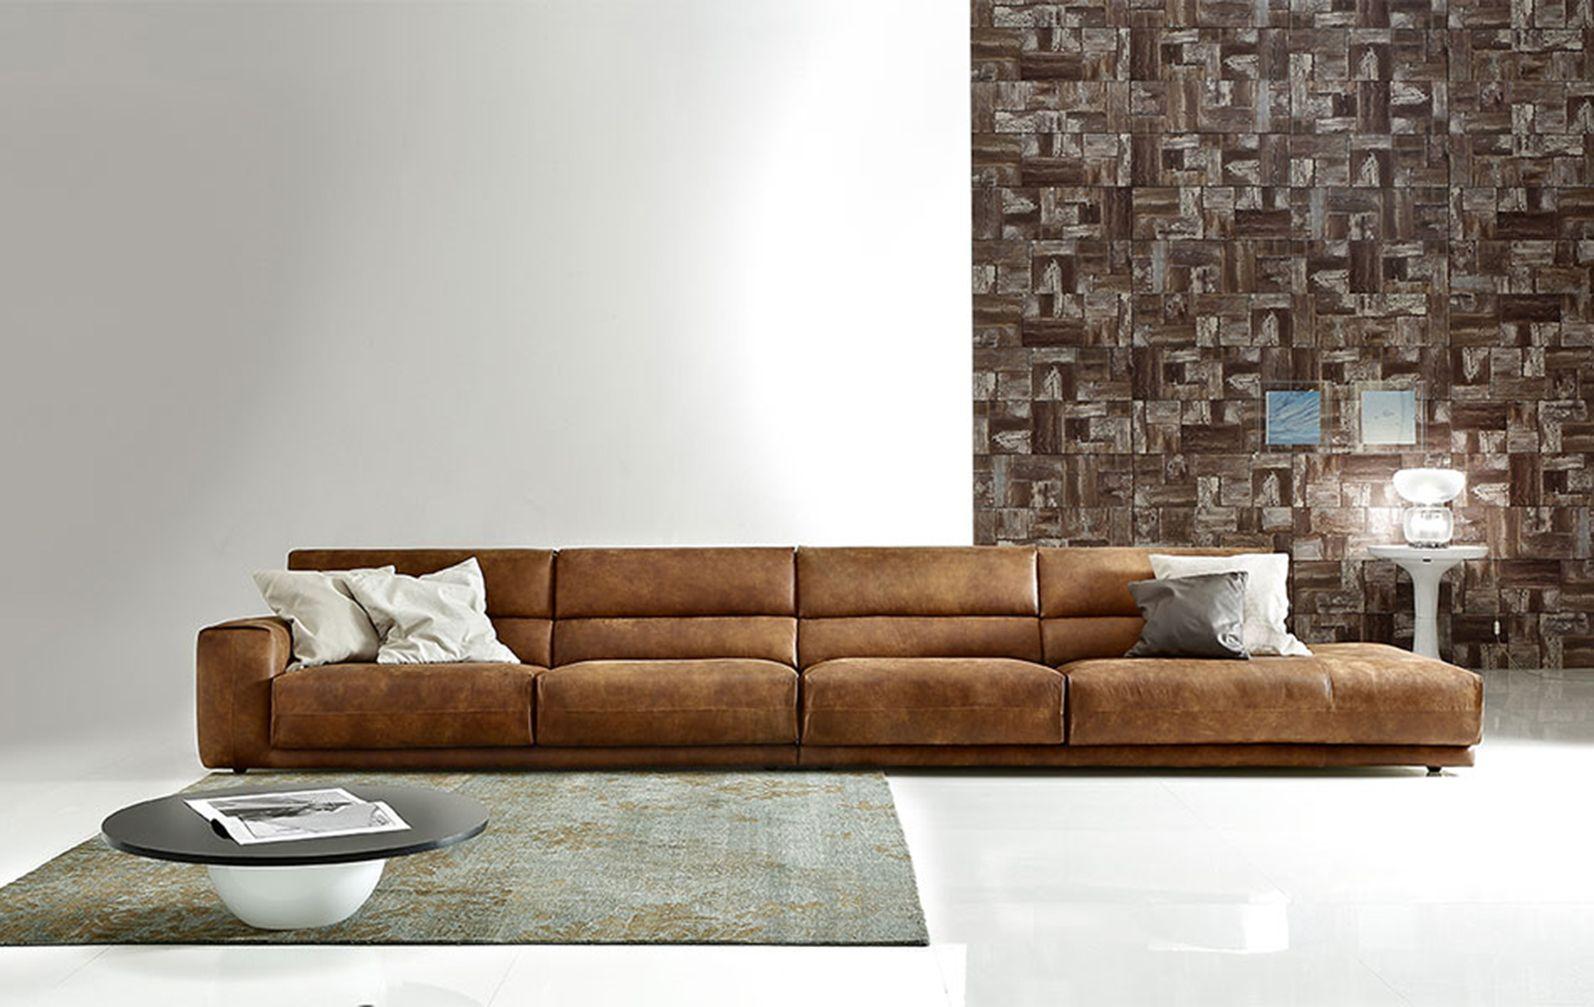 Booman sofa by Ditre Italia. Products Sofas Divani